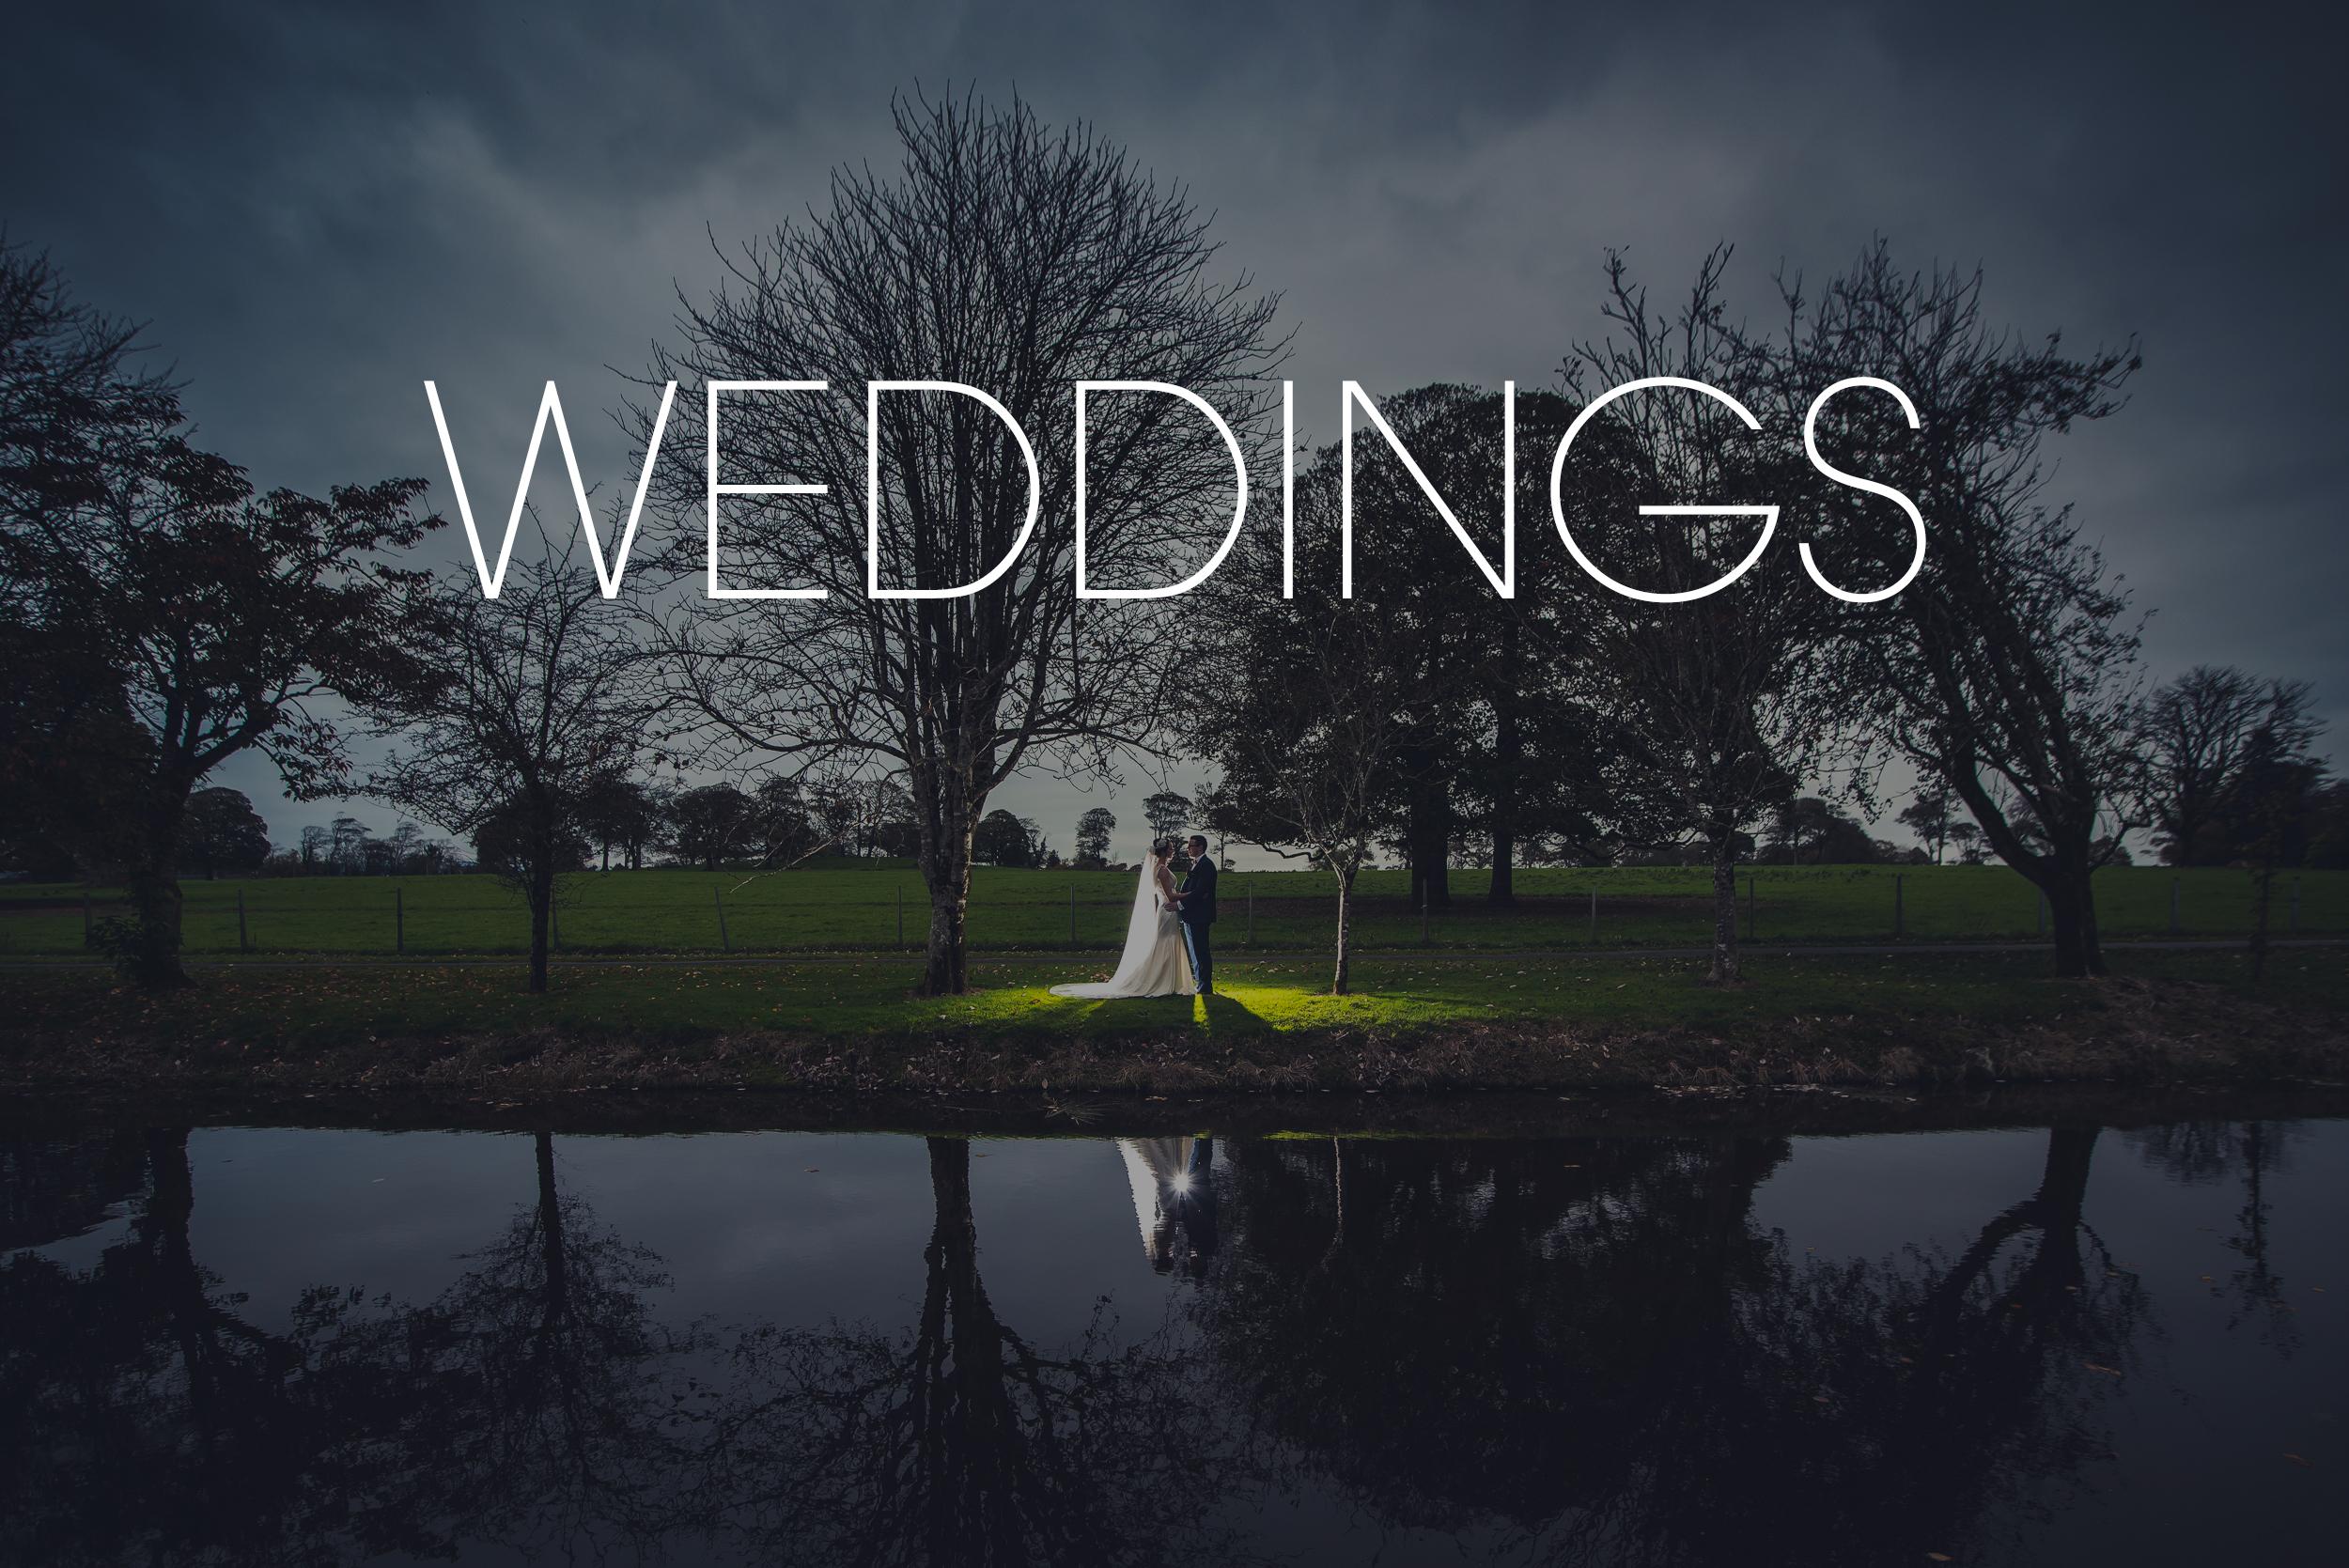 Weddings by DigiCol Photography